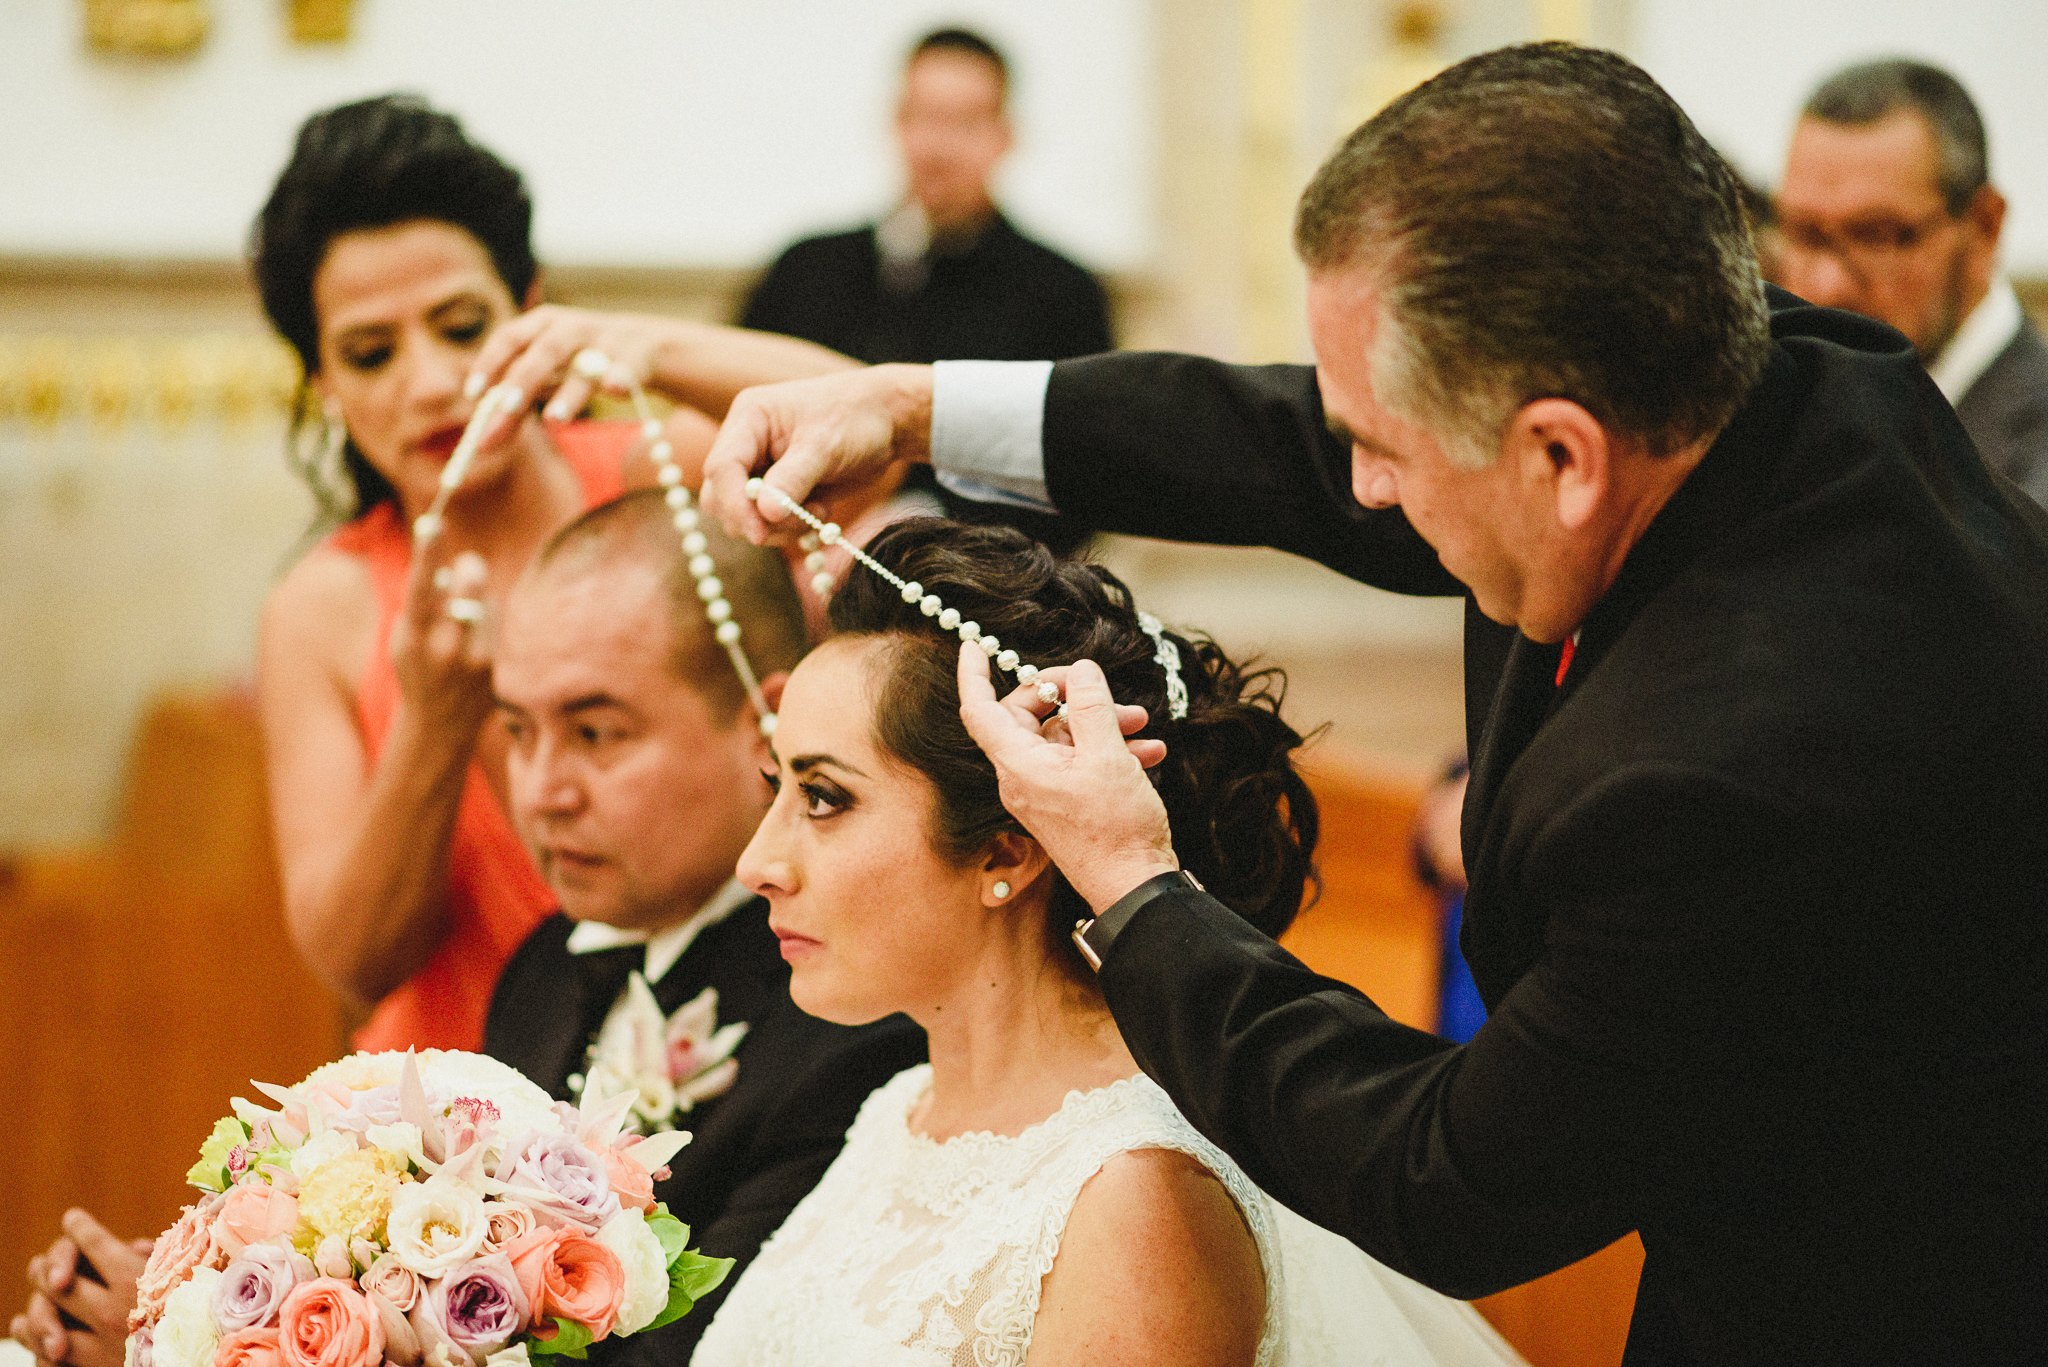 Wedding-Boda-Tulancingo-Hidalgo-Salon-Essenzia-Luis-Houdin-29-film